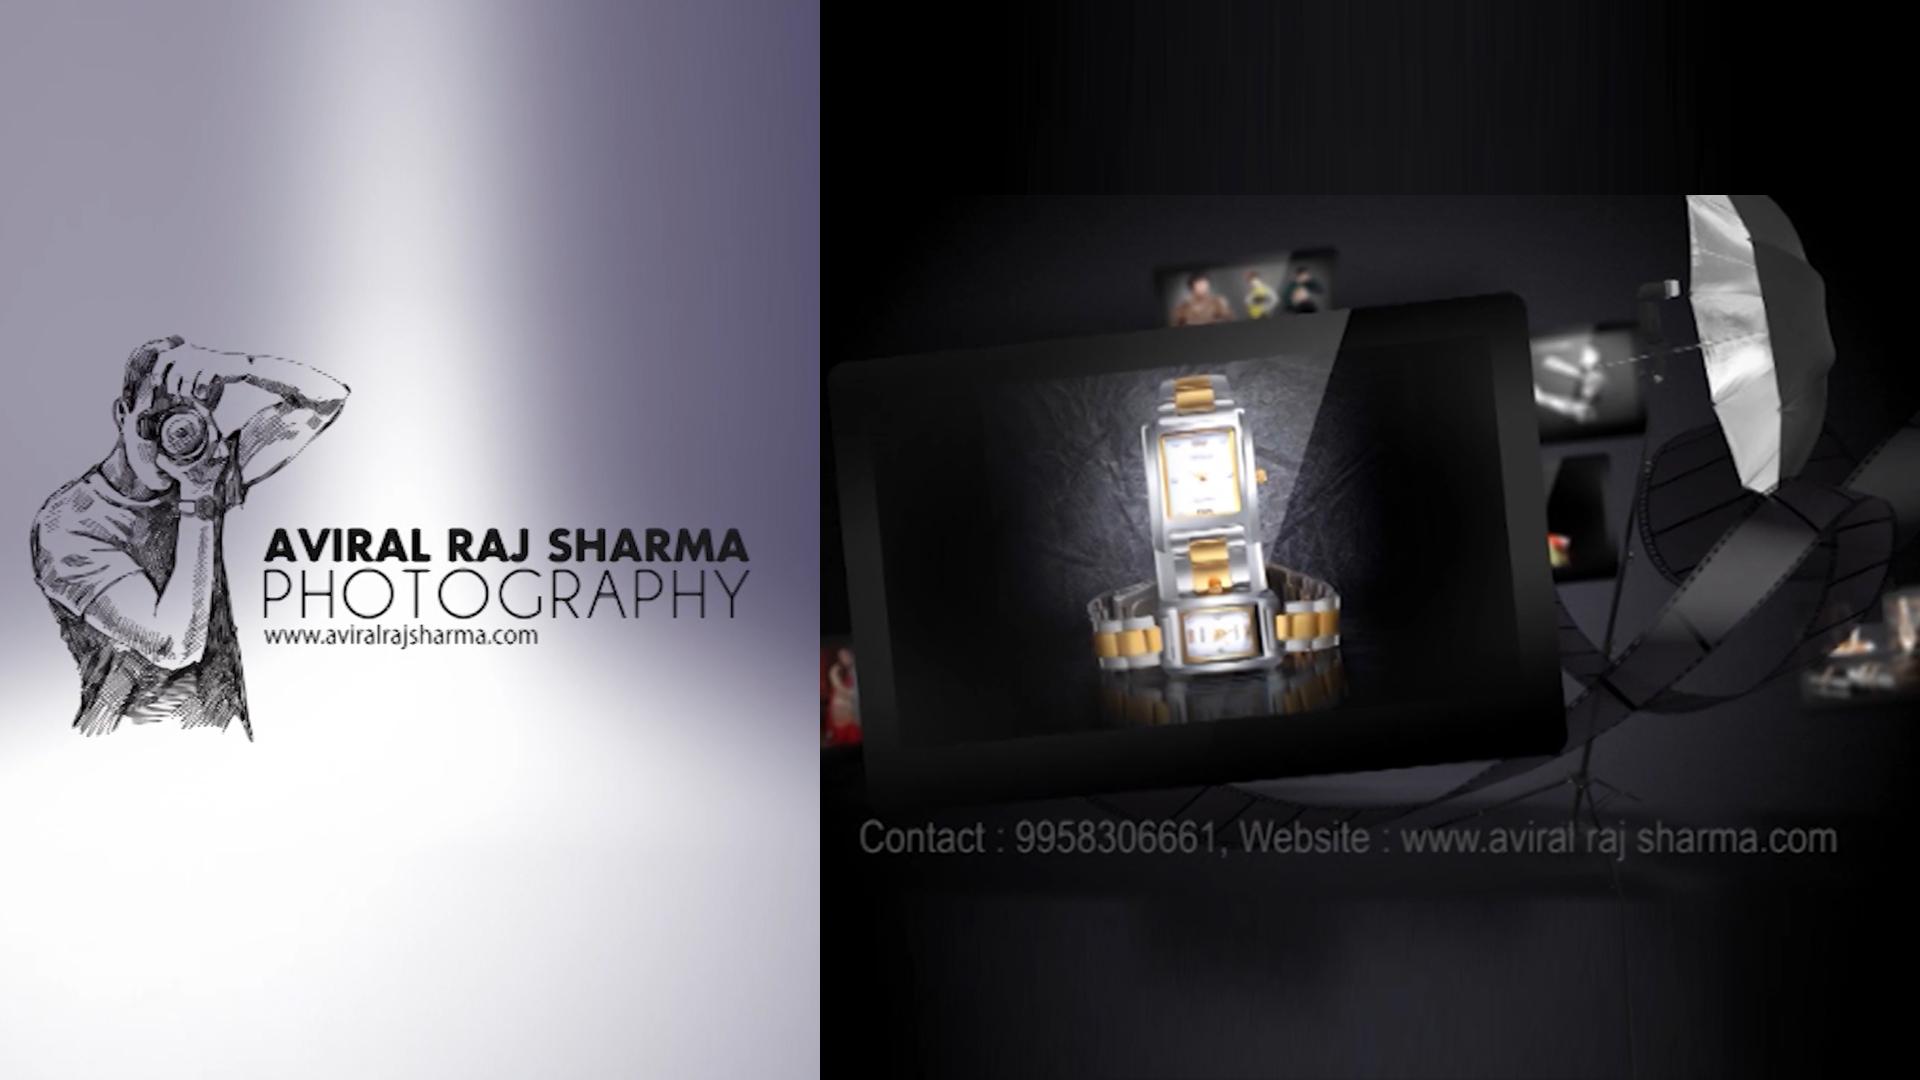 Aviral Raj Sharma Photography Profile - camera-craft